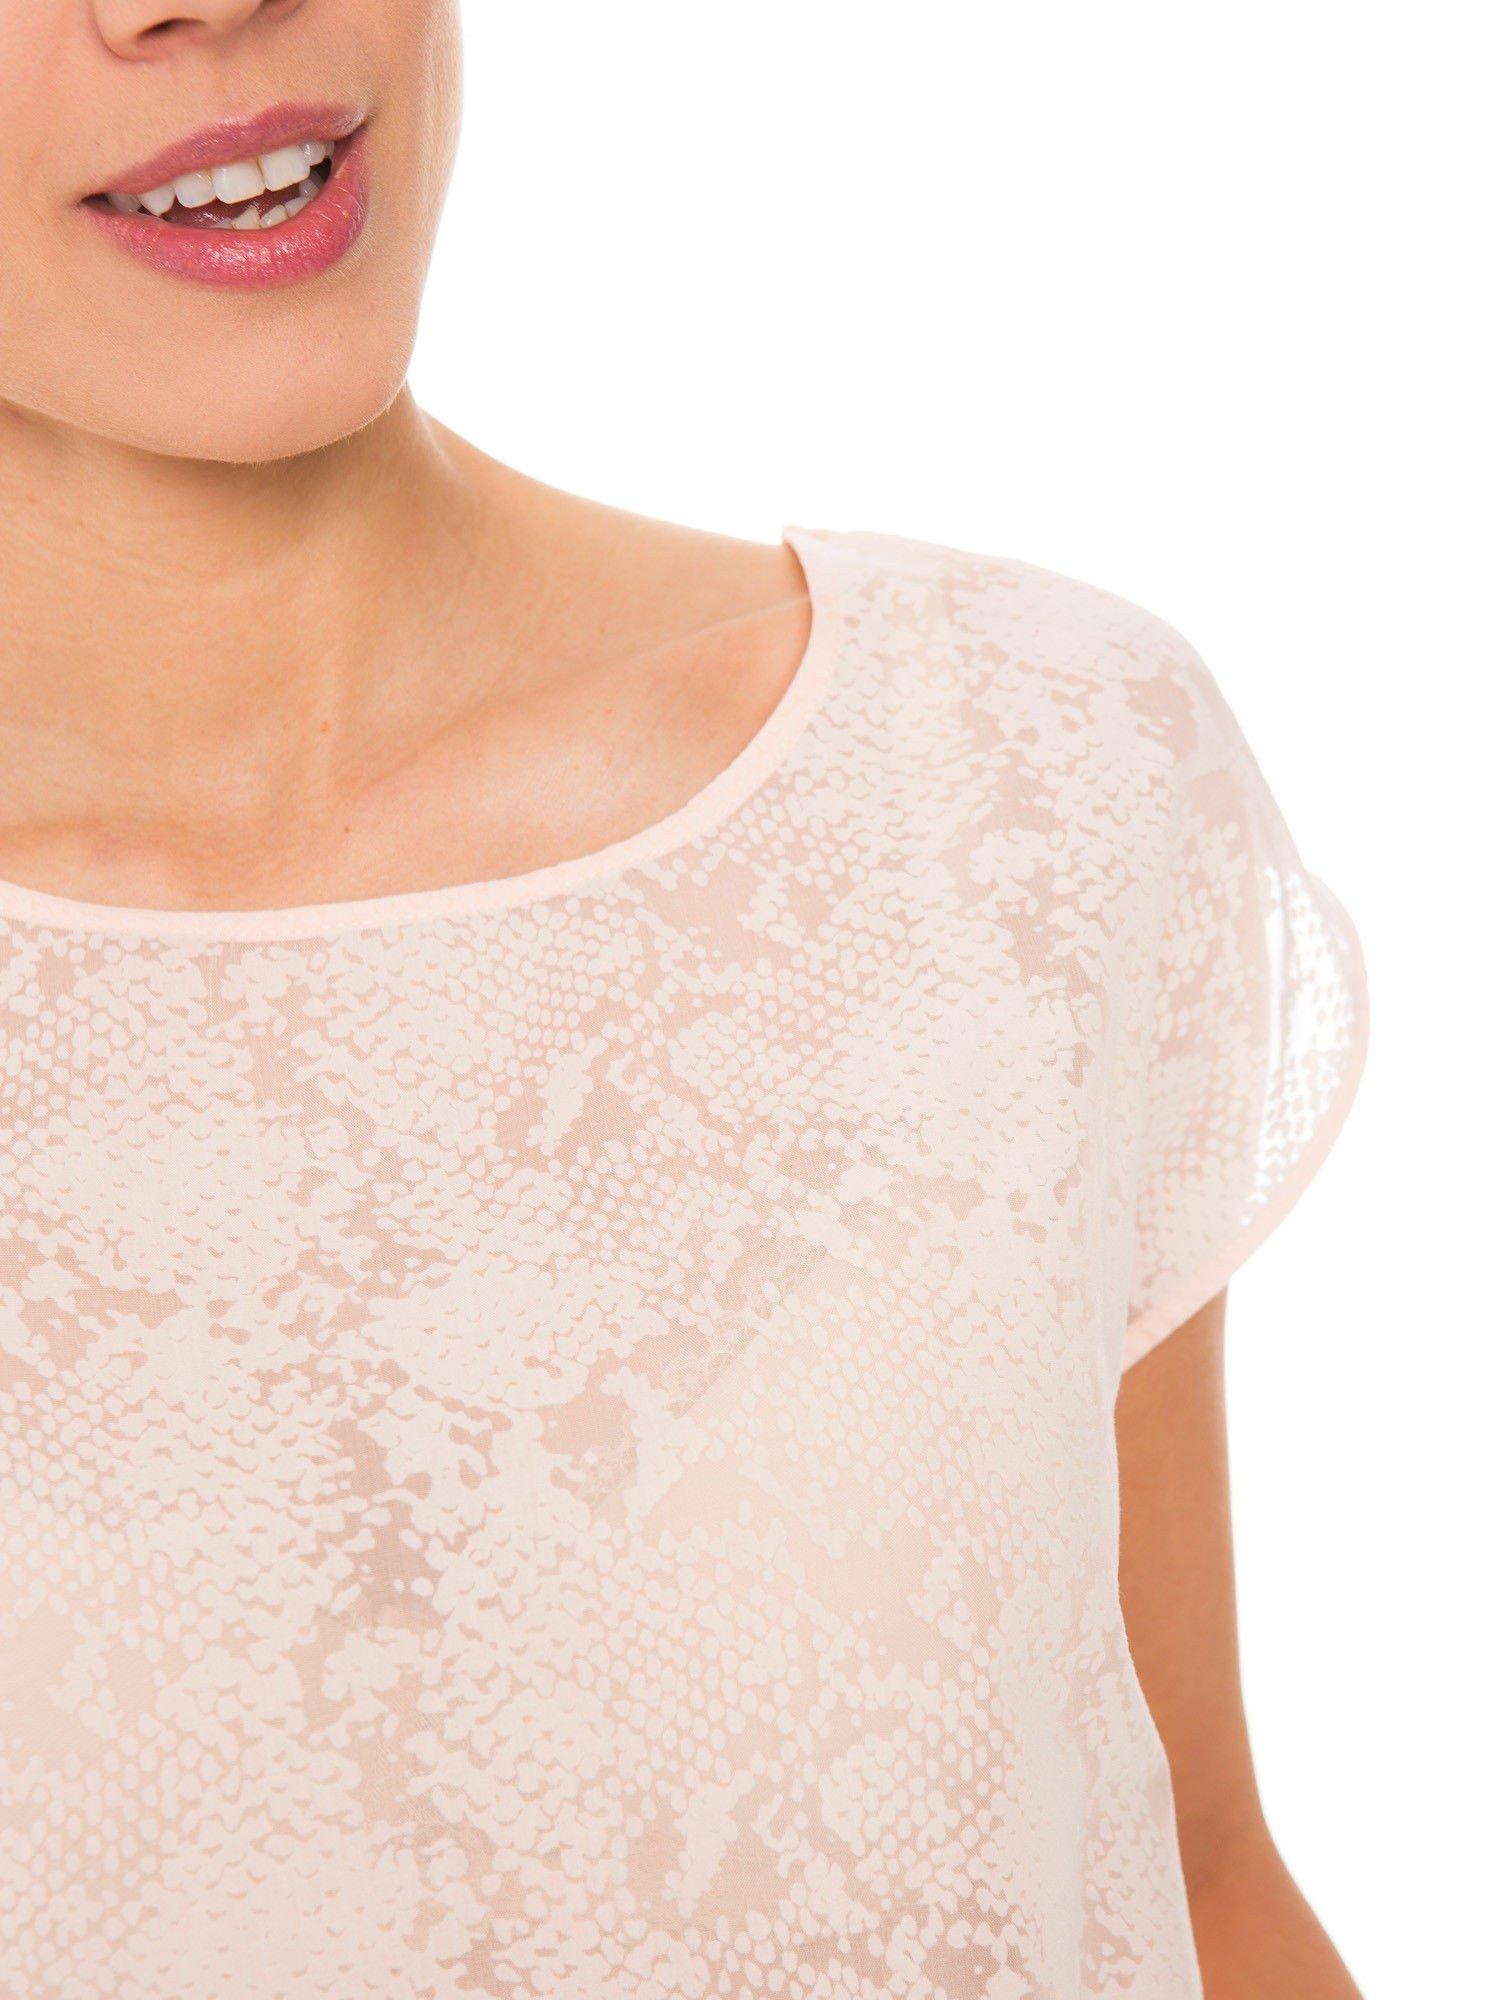 Koralowa transparentna koszula                                  zdj.                                  3